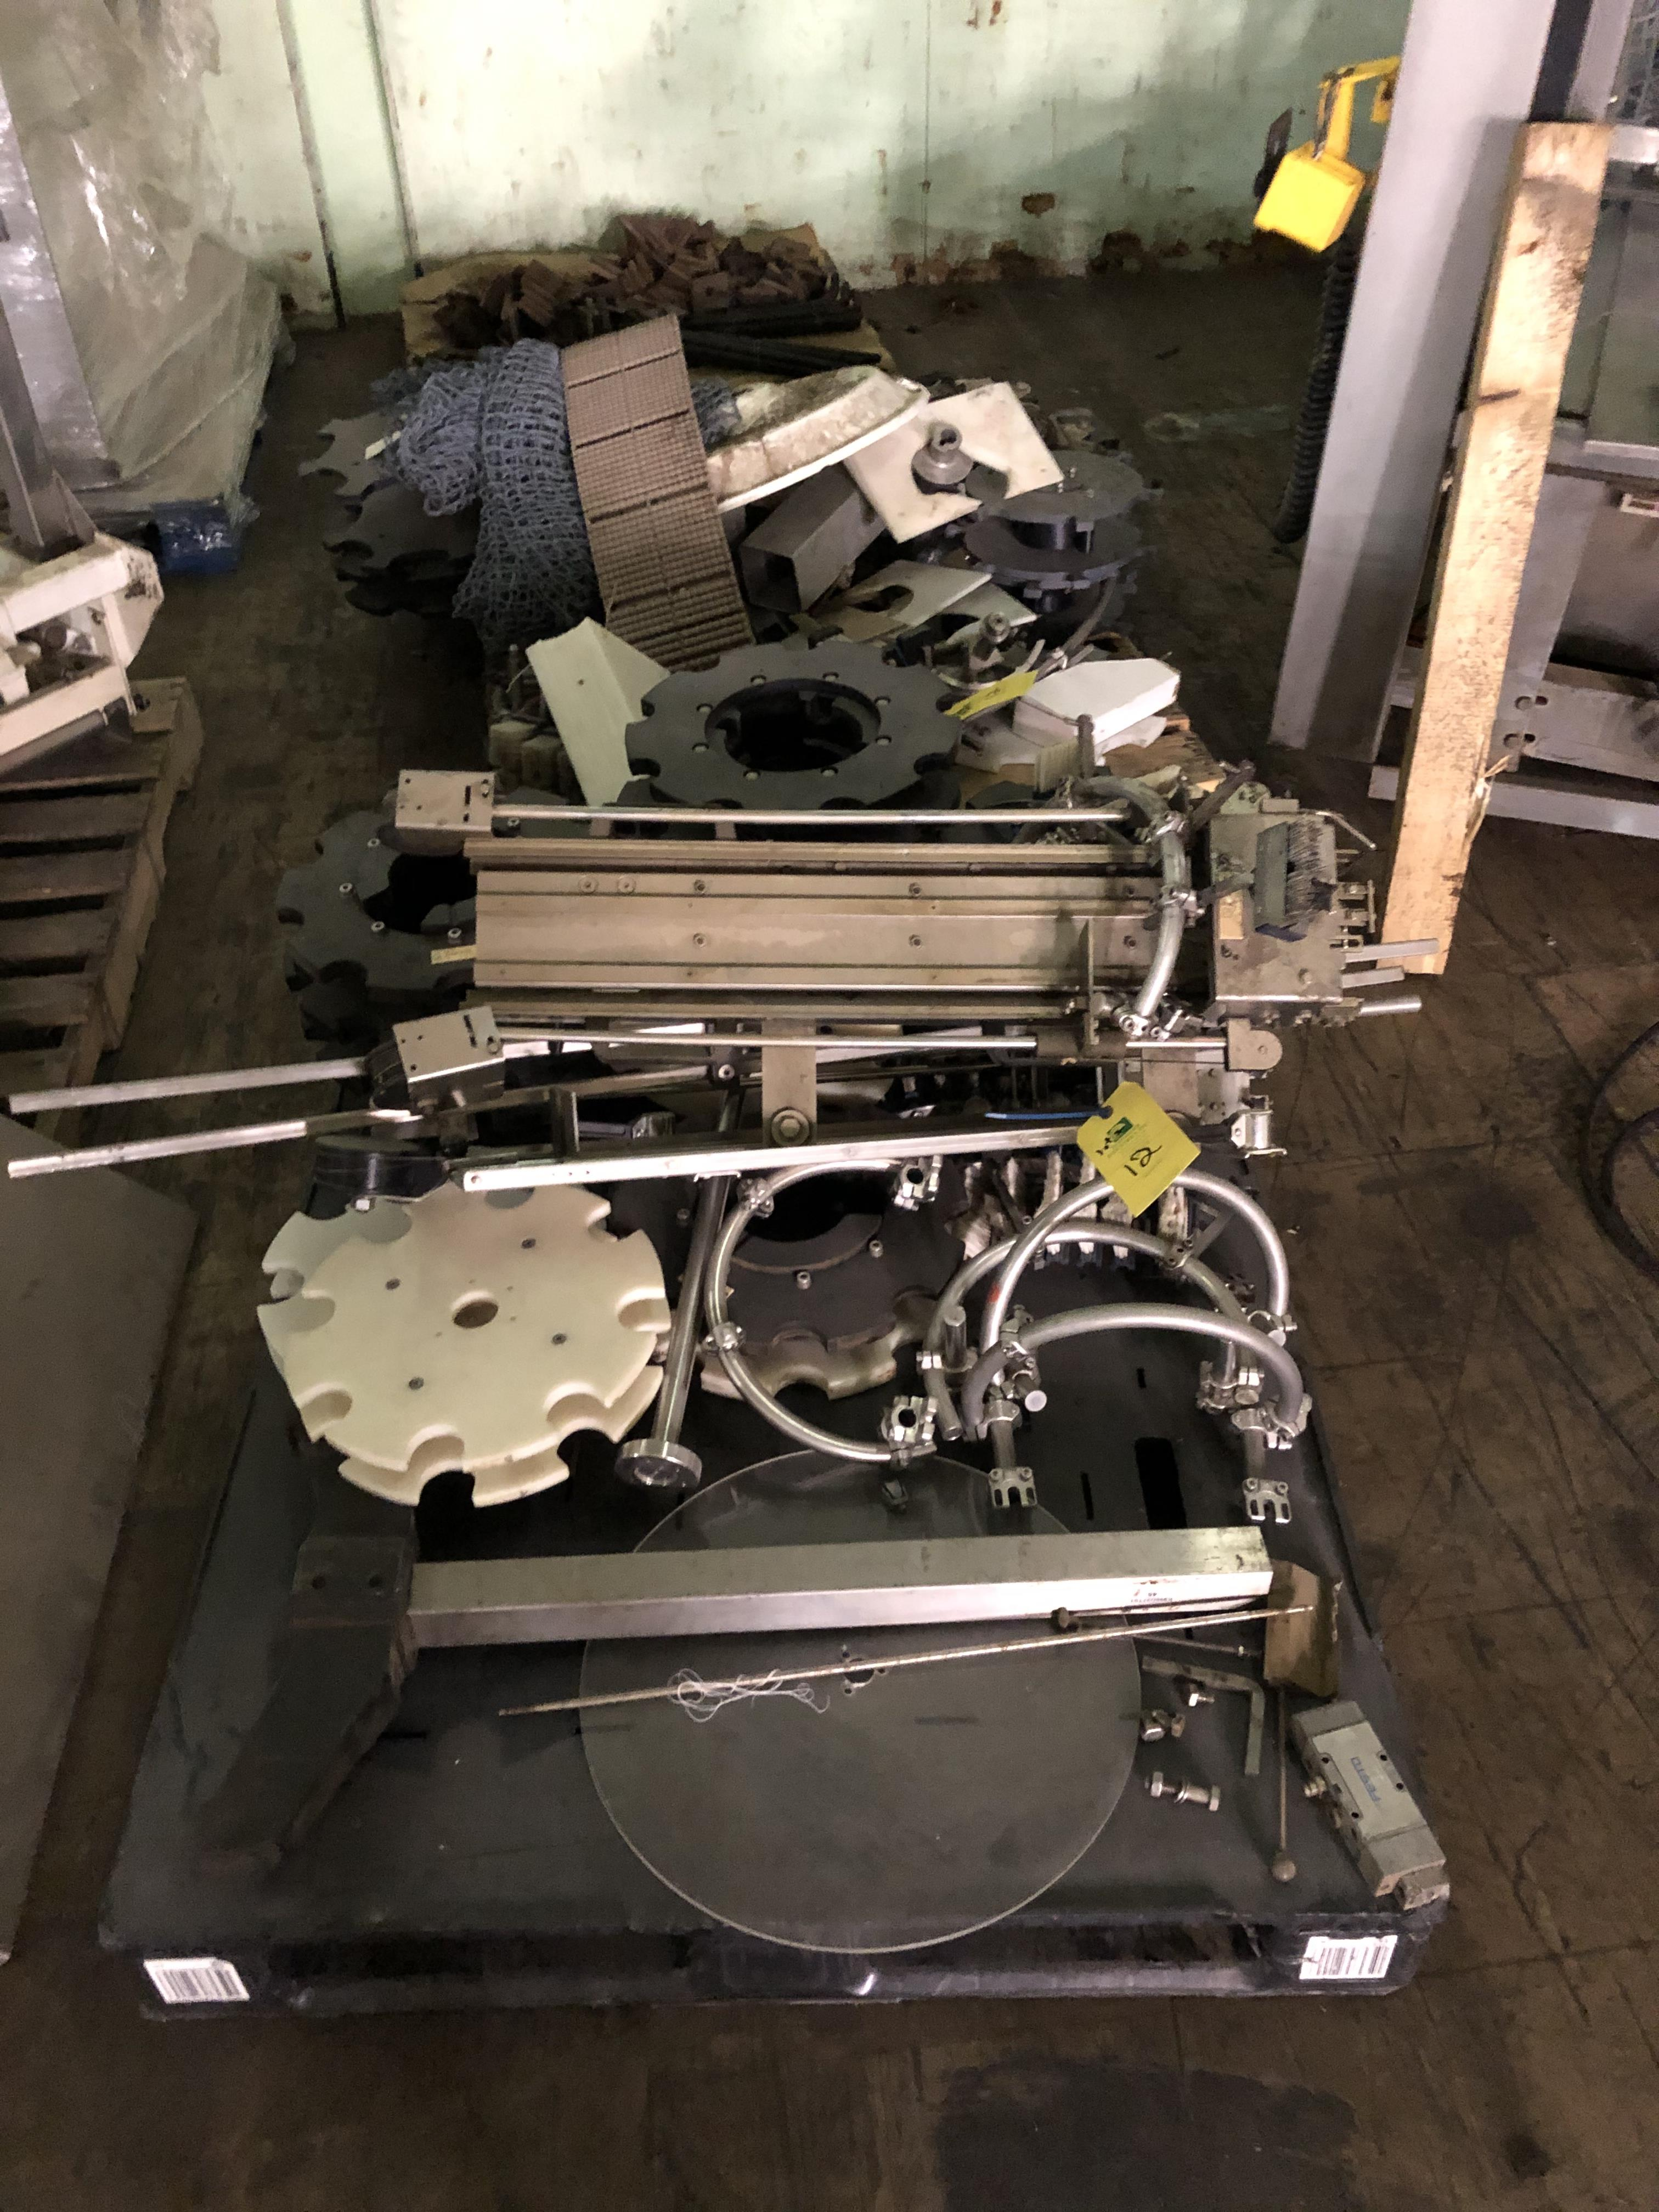 Krones Labeler, Parts & Components, RIGGING FEE - $75